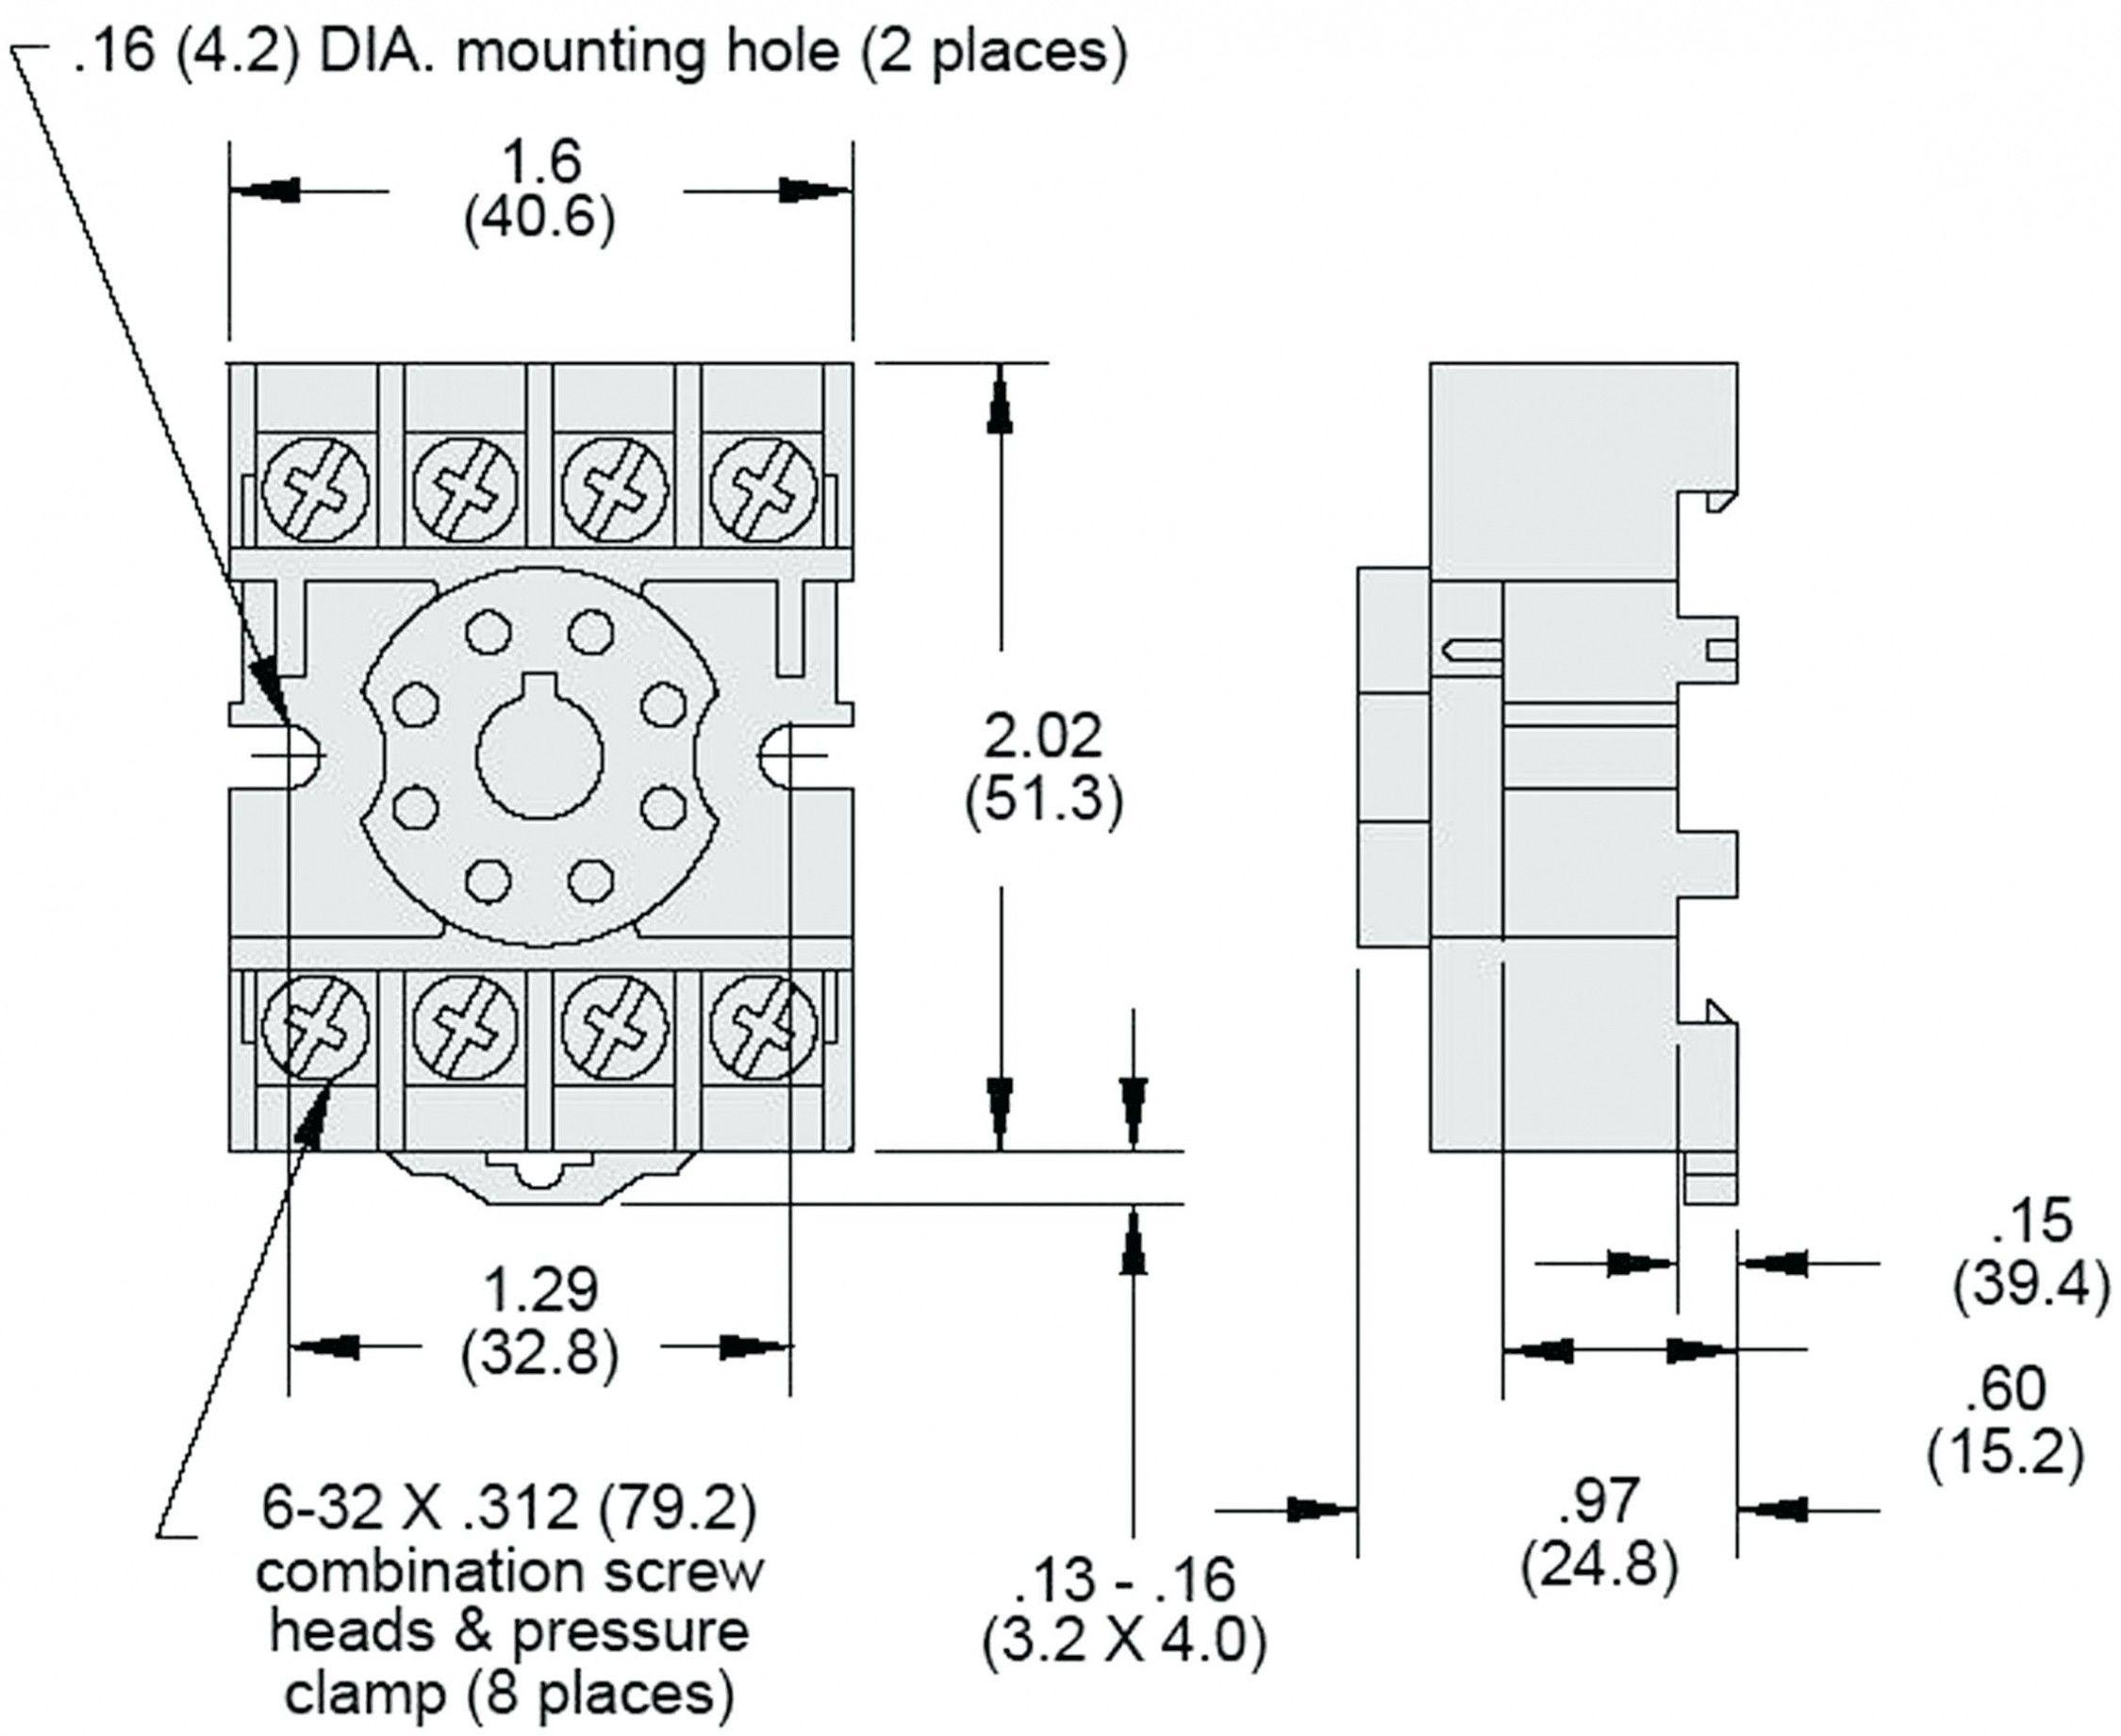 Luxury Wiring Diagram Teb7as Diagrams Digramssample Diagramimages Wiringdiagramsample Wiringdiagram Diagram Wire Timer